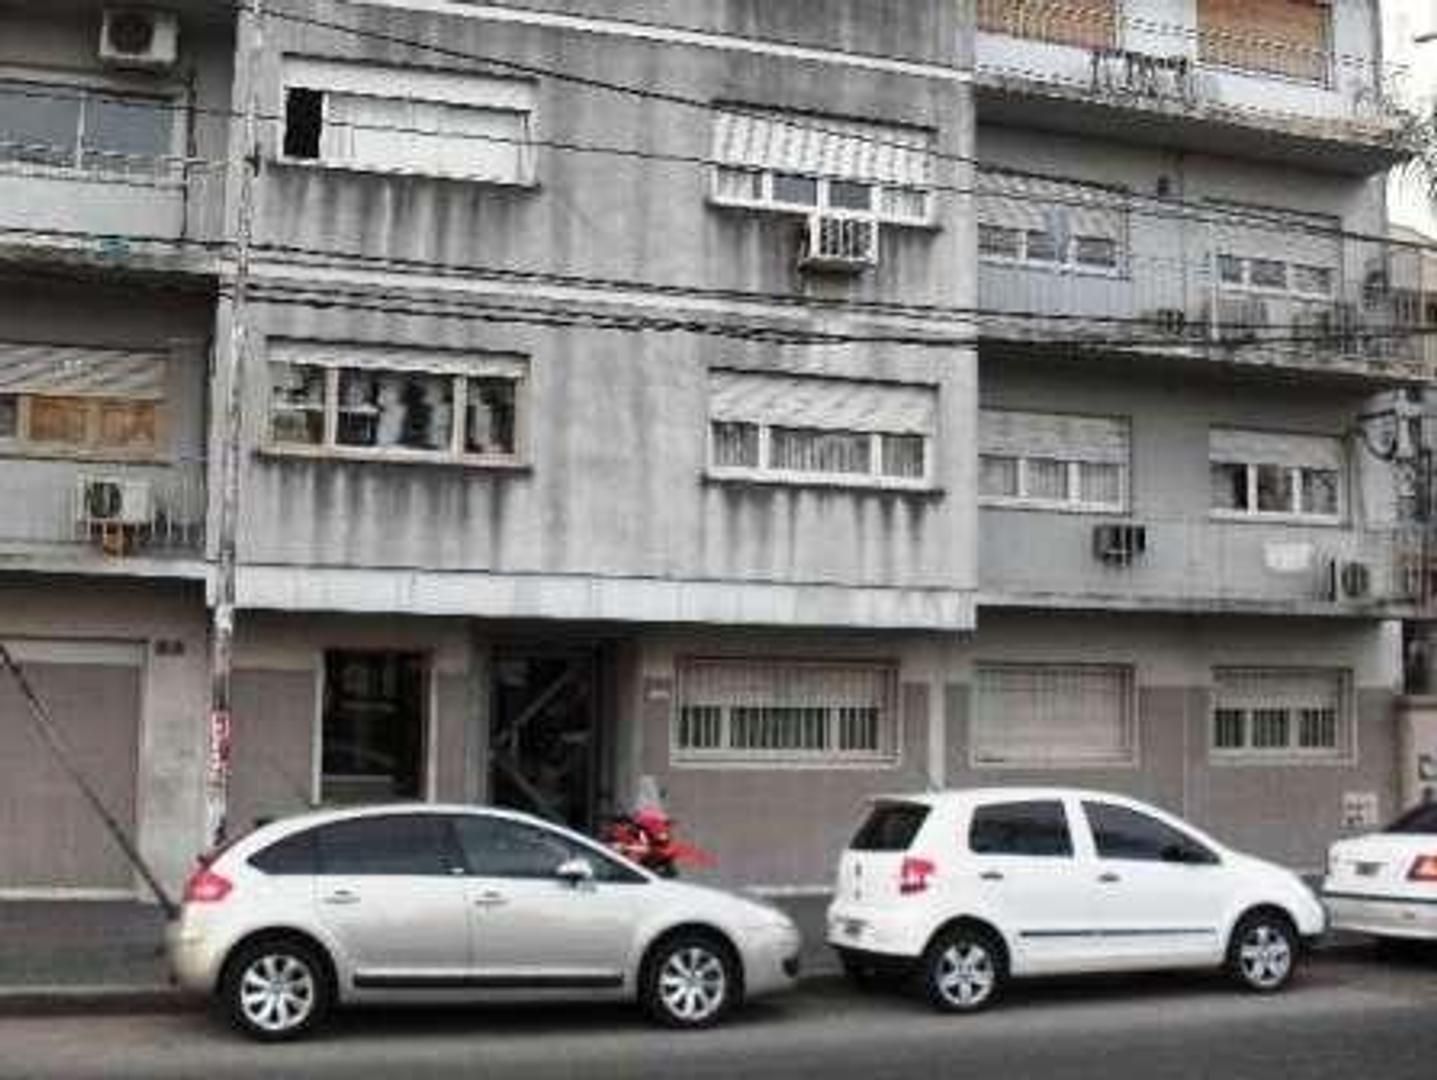 XINTEL(MGG-MGG-1673) Departamento - Venta - Argentina, La Matanza - ALEM, LEANDRO N 355